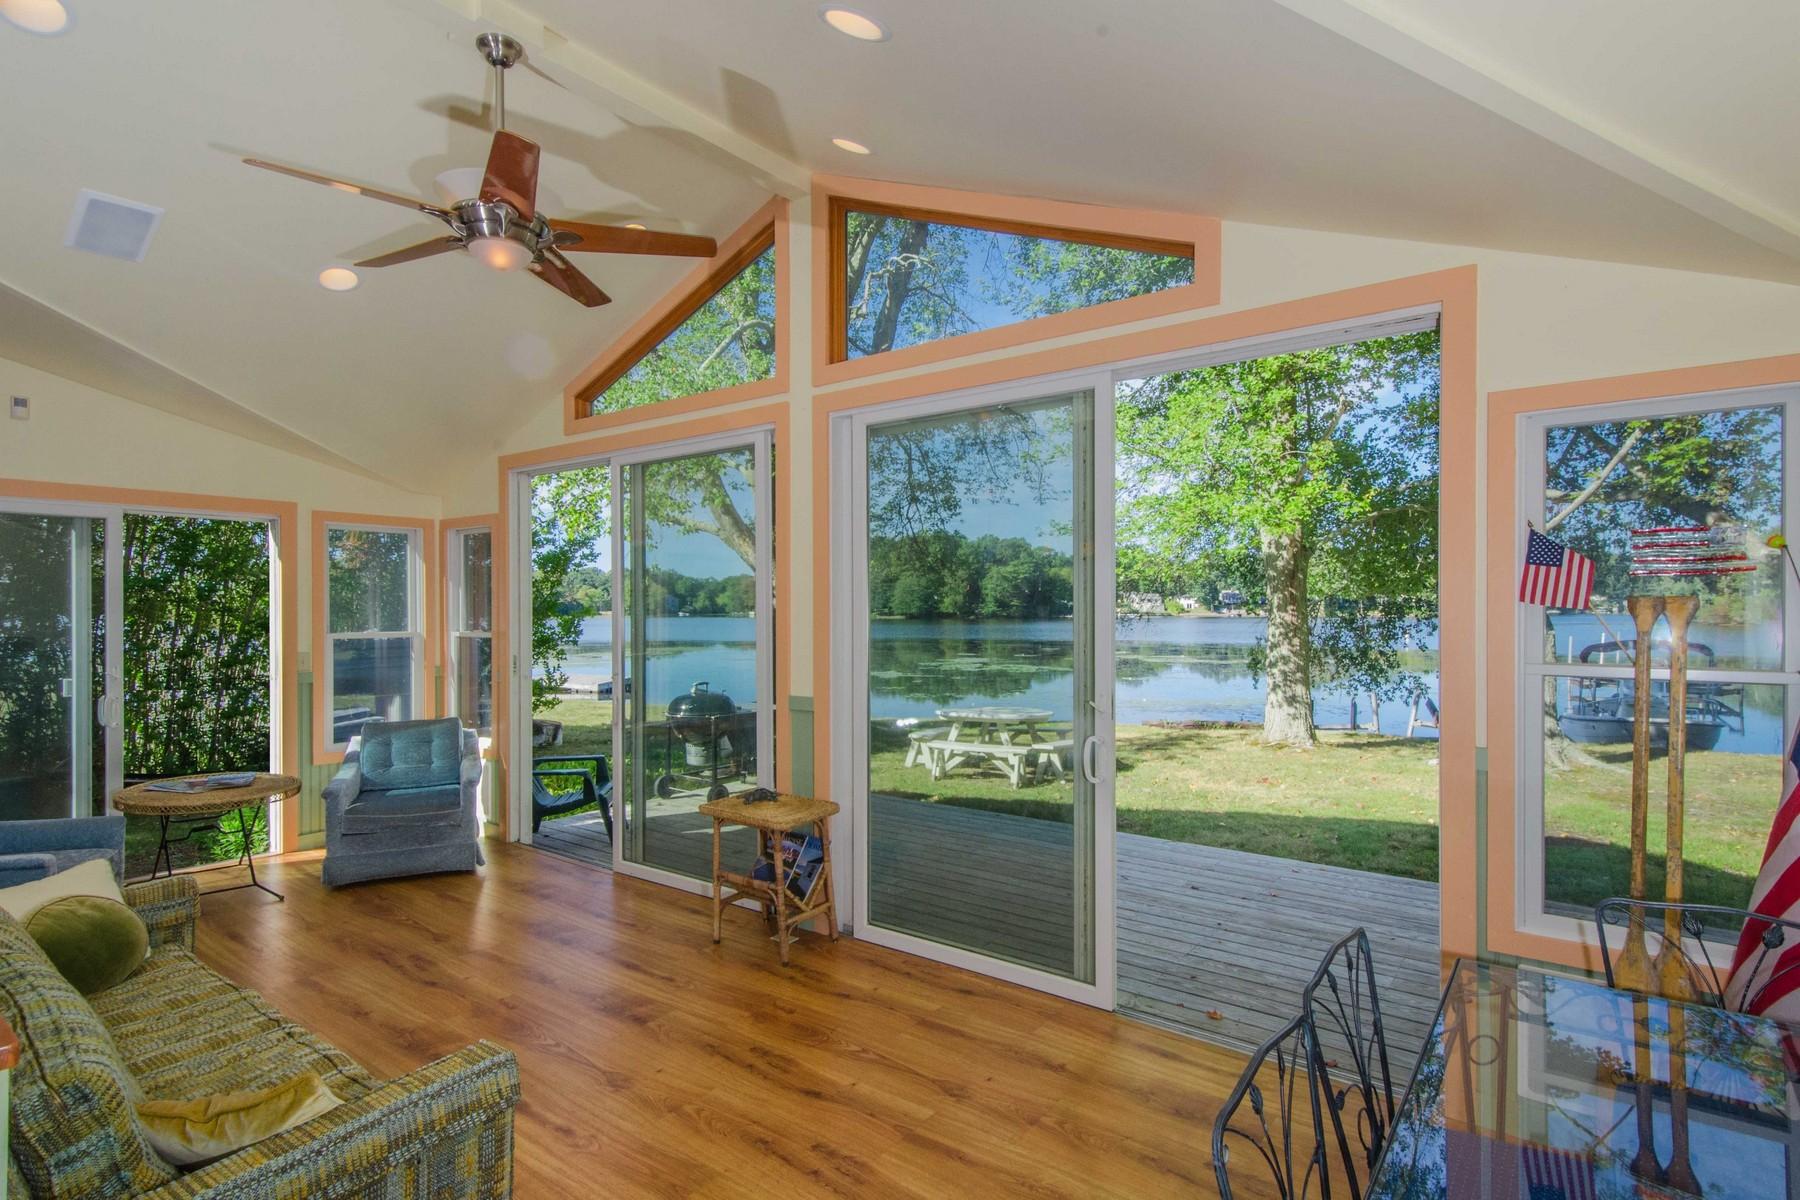 独户住宅 为 销售 在 Spectacular Water Views 78 Grassy Hill Road Old Lyme, 康涅狄格州 06371 美国